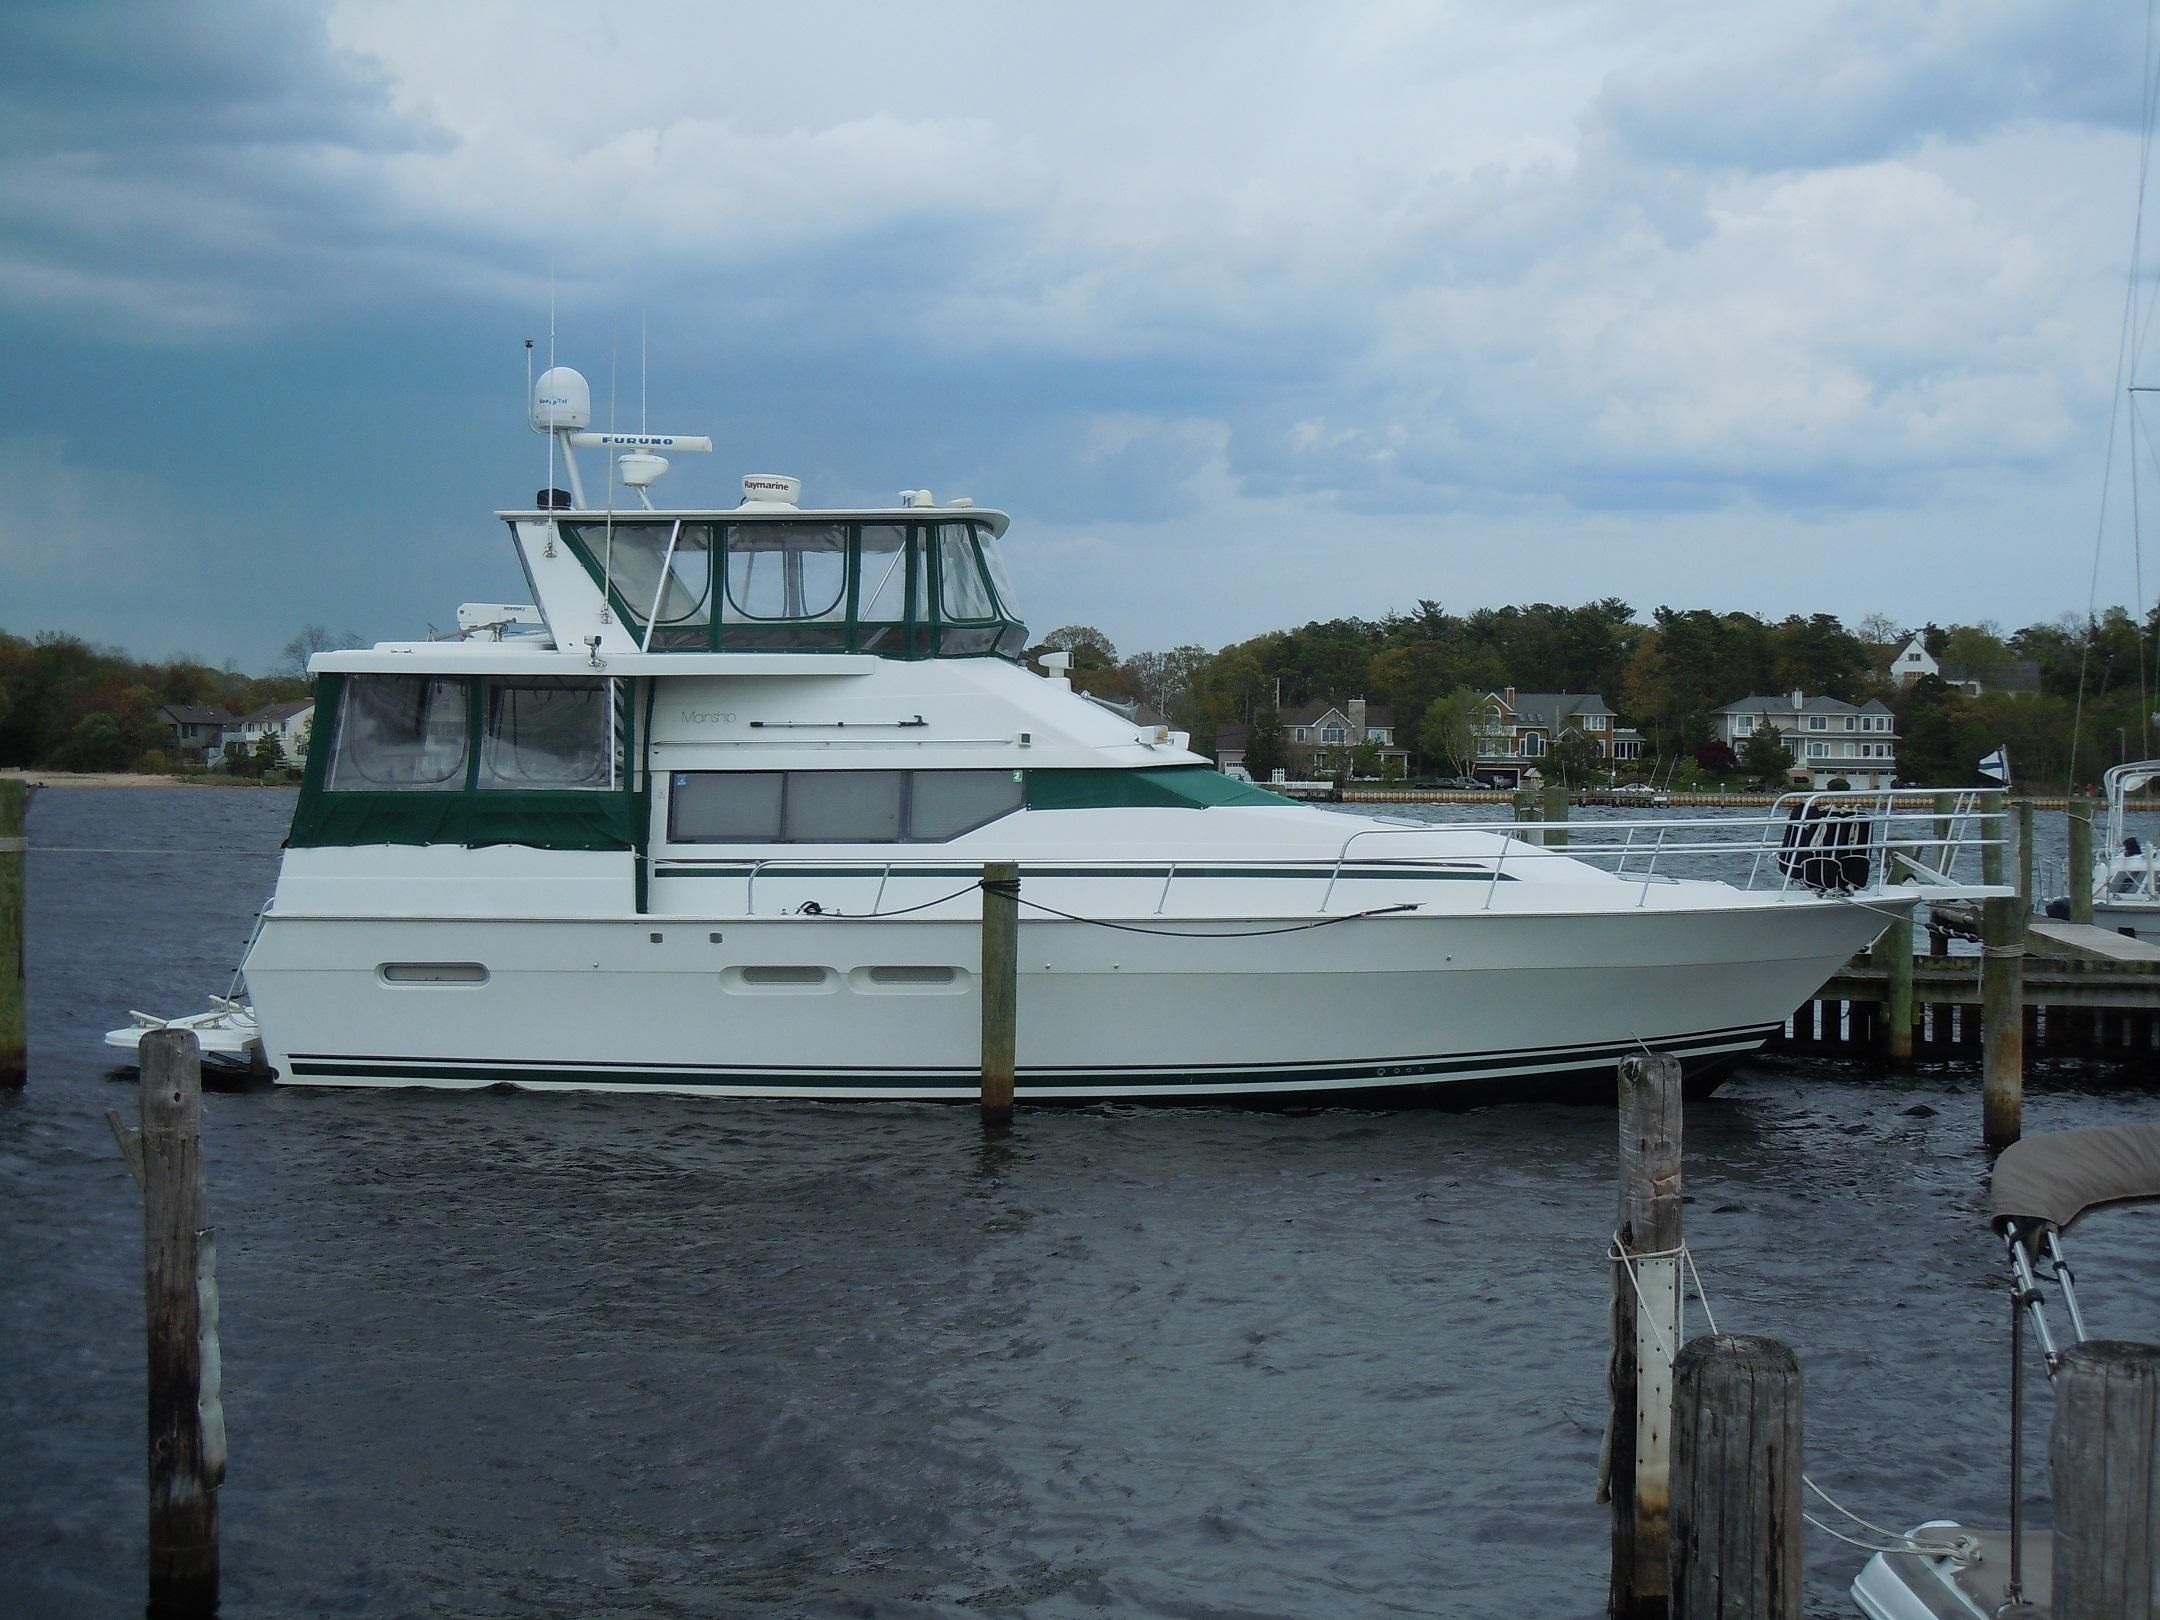 47 Atlantic Motor Vessel: 1995 Mainship 47 Motor Yacht Power Boat For Sale